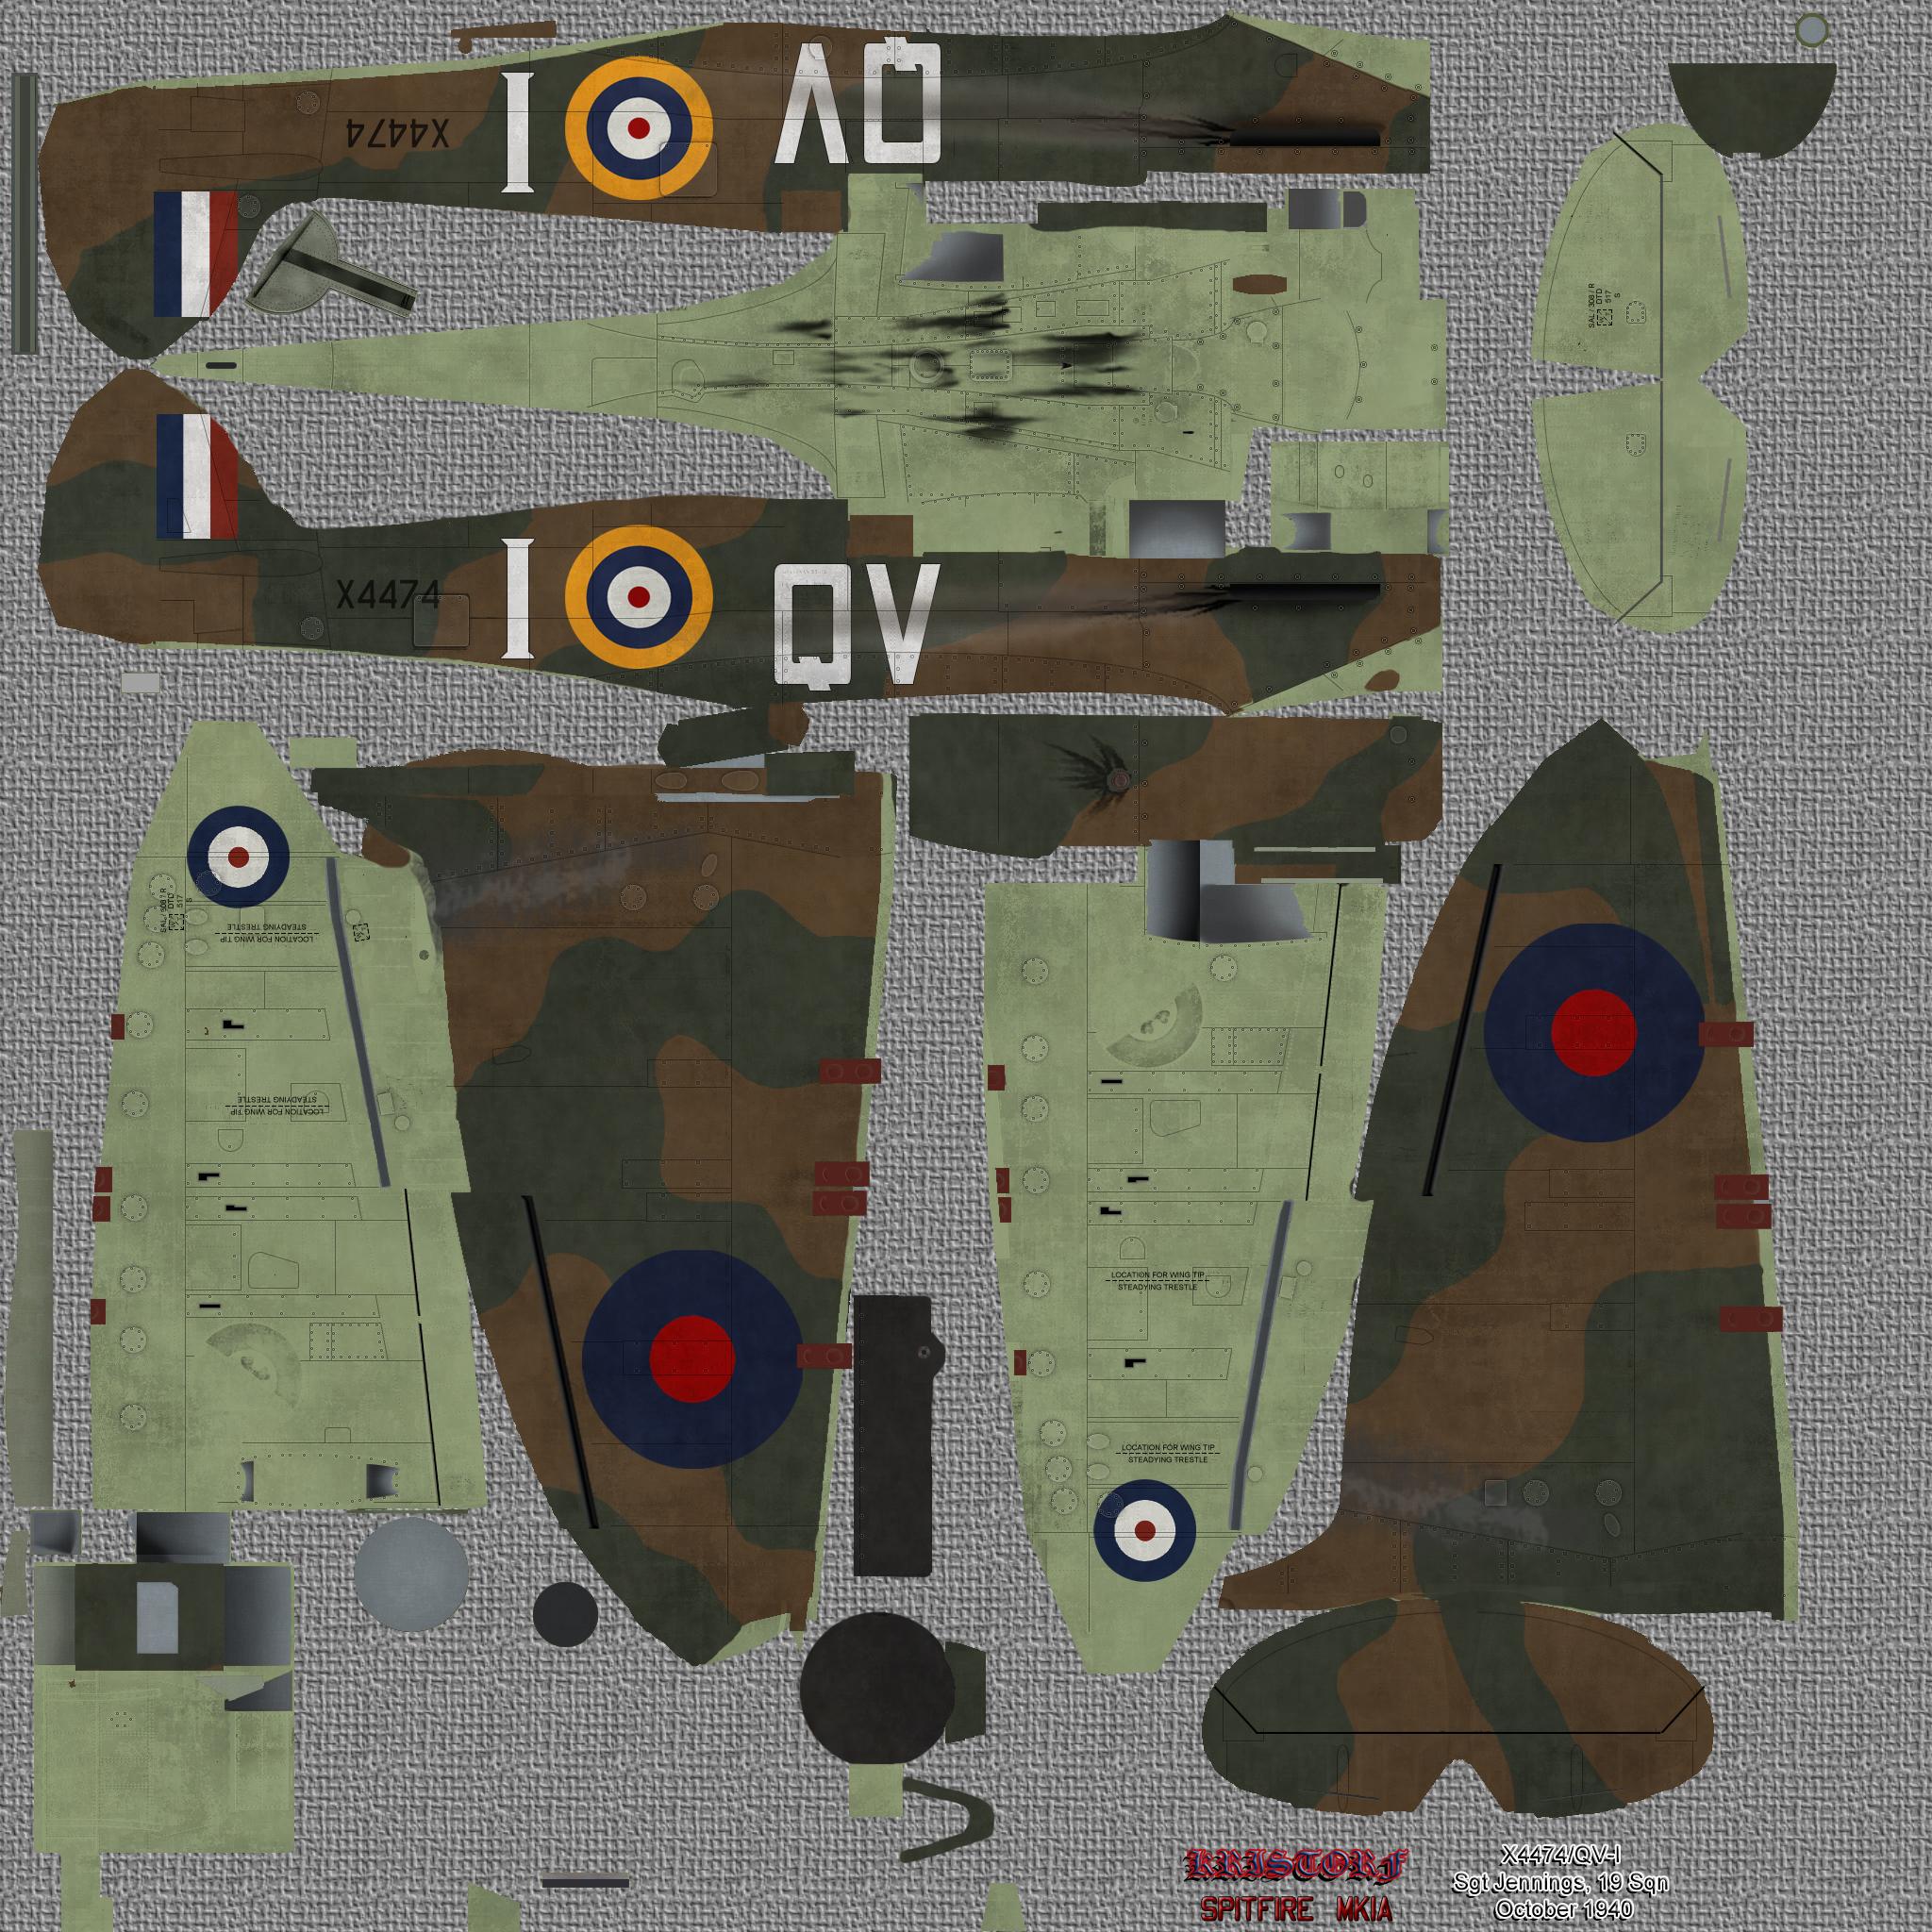 COD KF MkIa RAF 19Sqn QVI Sgt Jennings X4474 Fowlemere Sep 1940